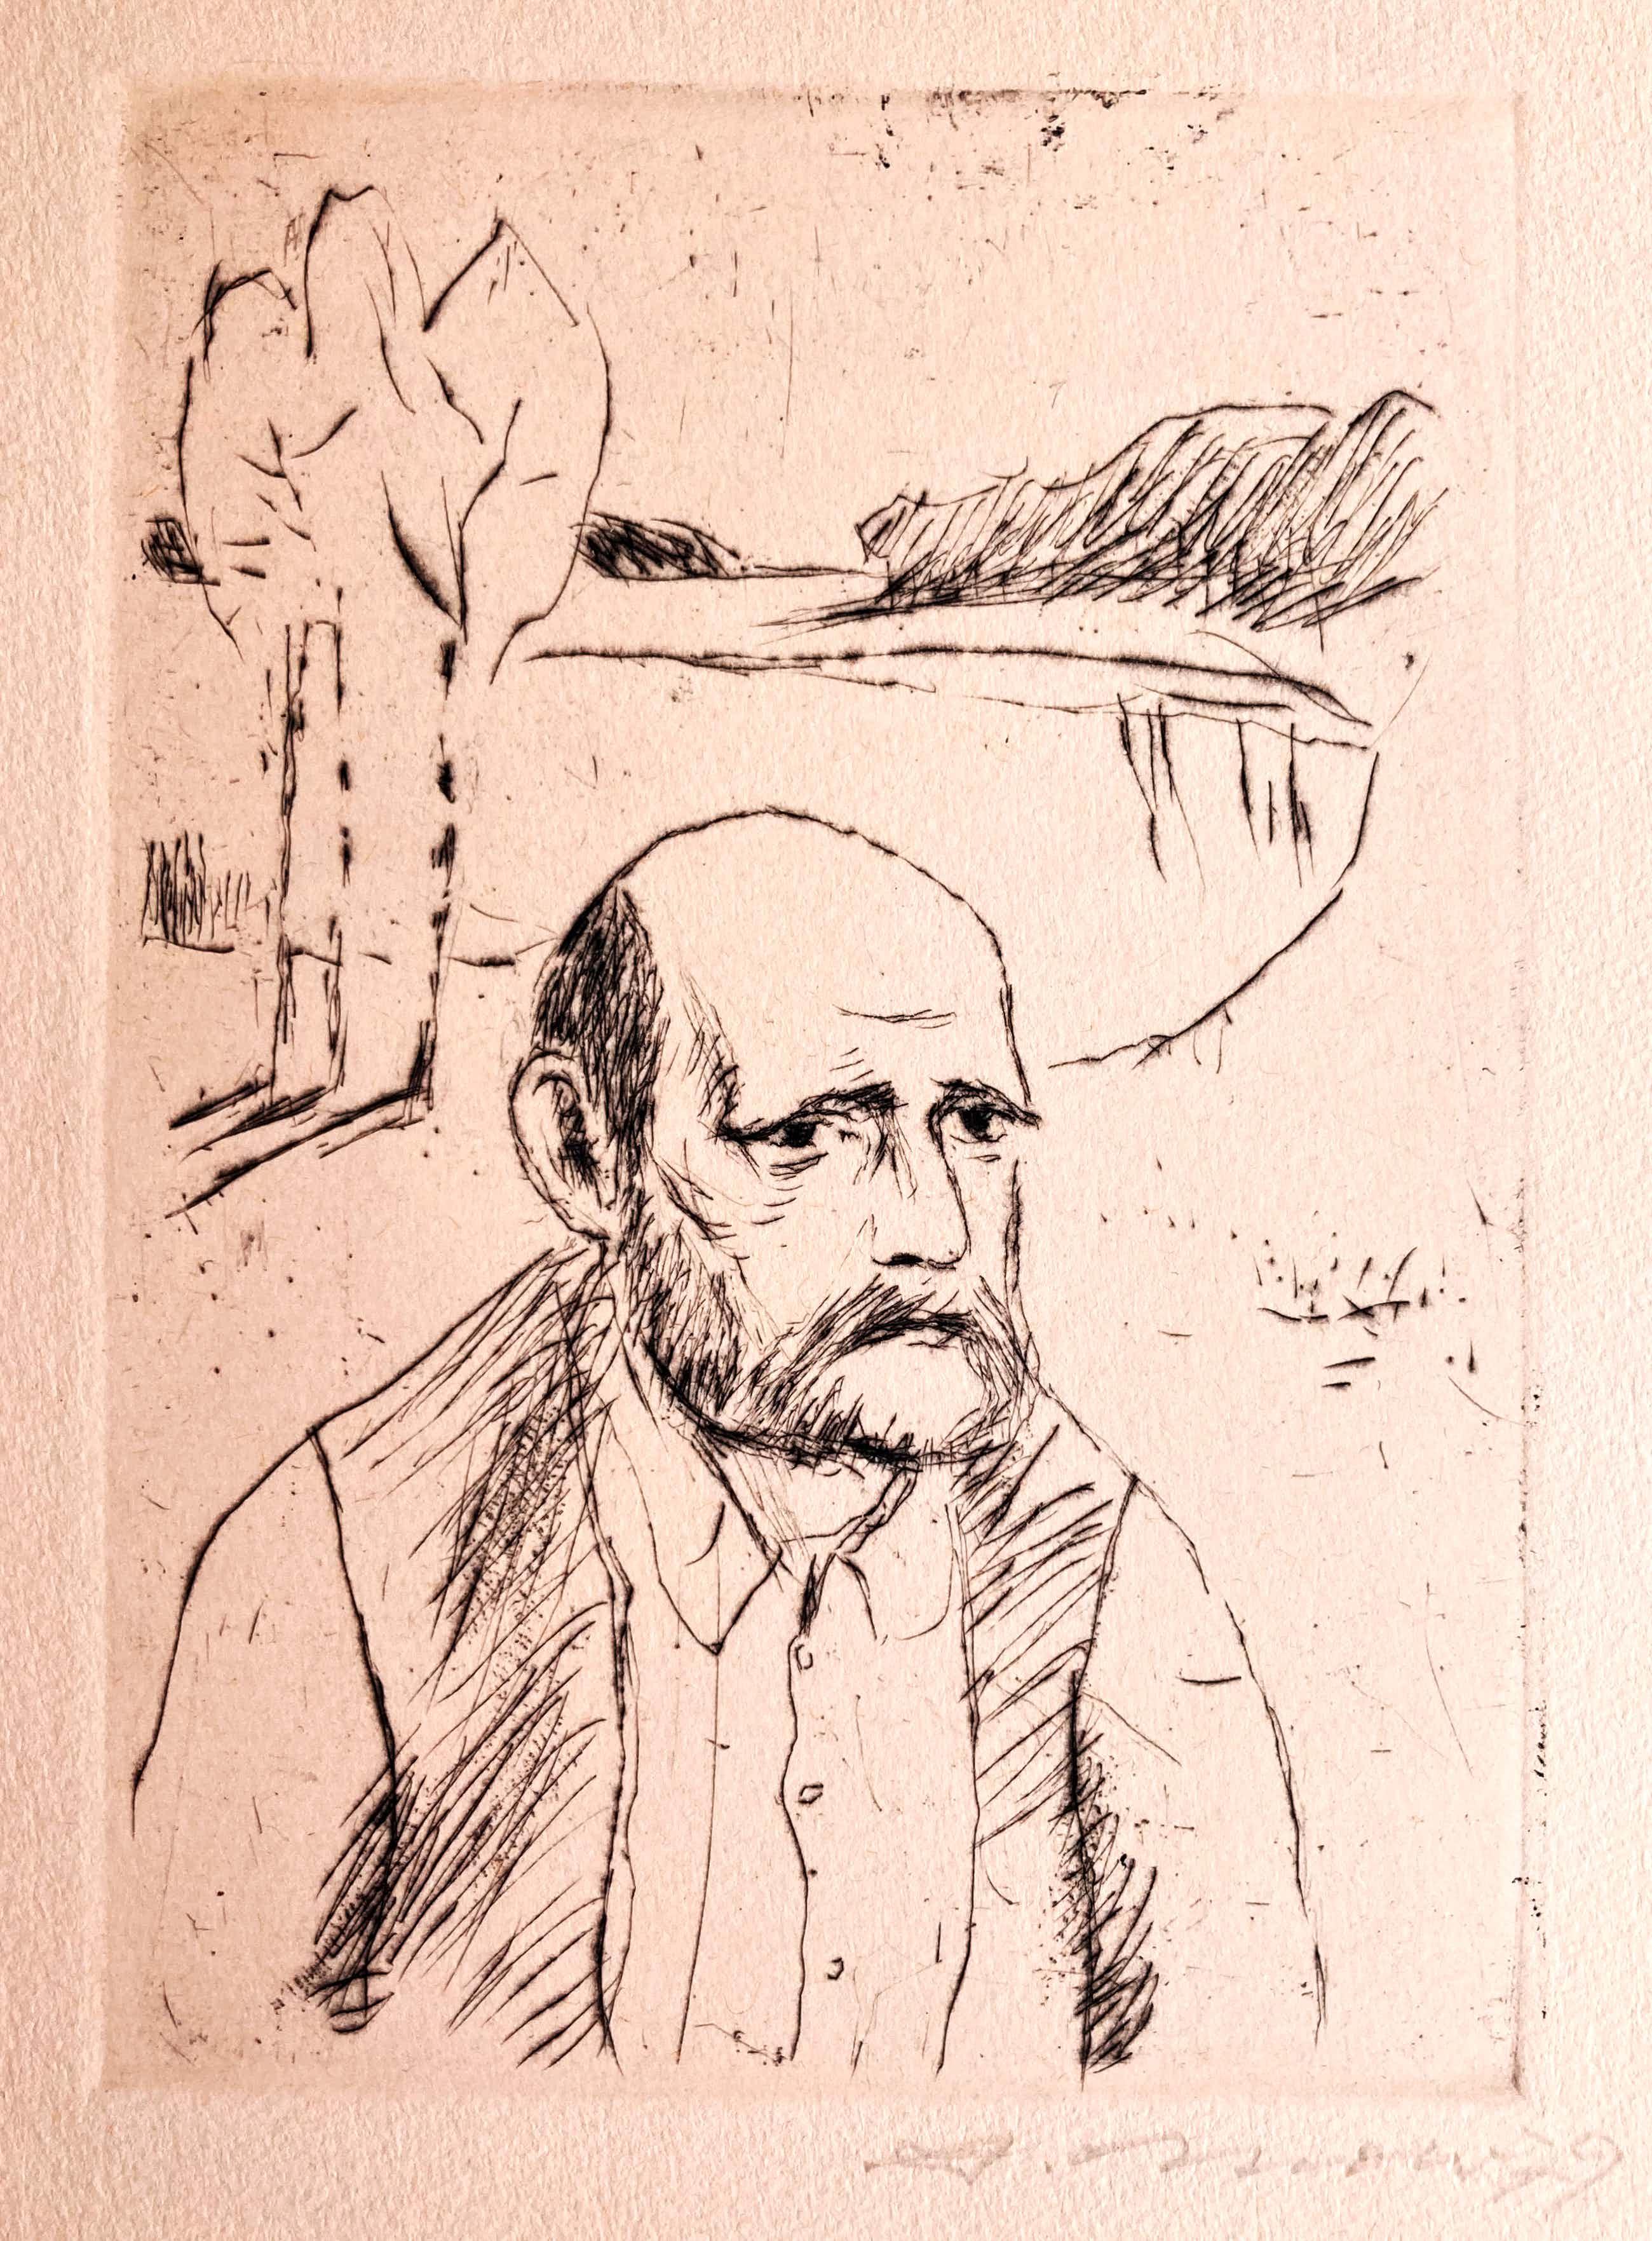 Arno Mohr - Portrait Erwin Strittmatter kopen? Bied vanaf 190!